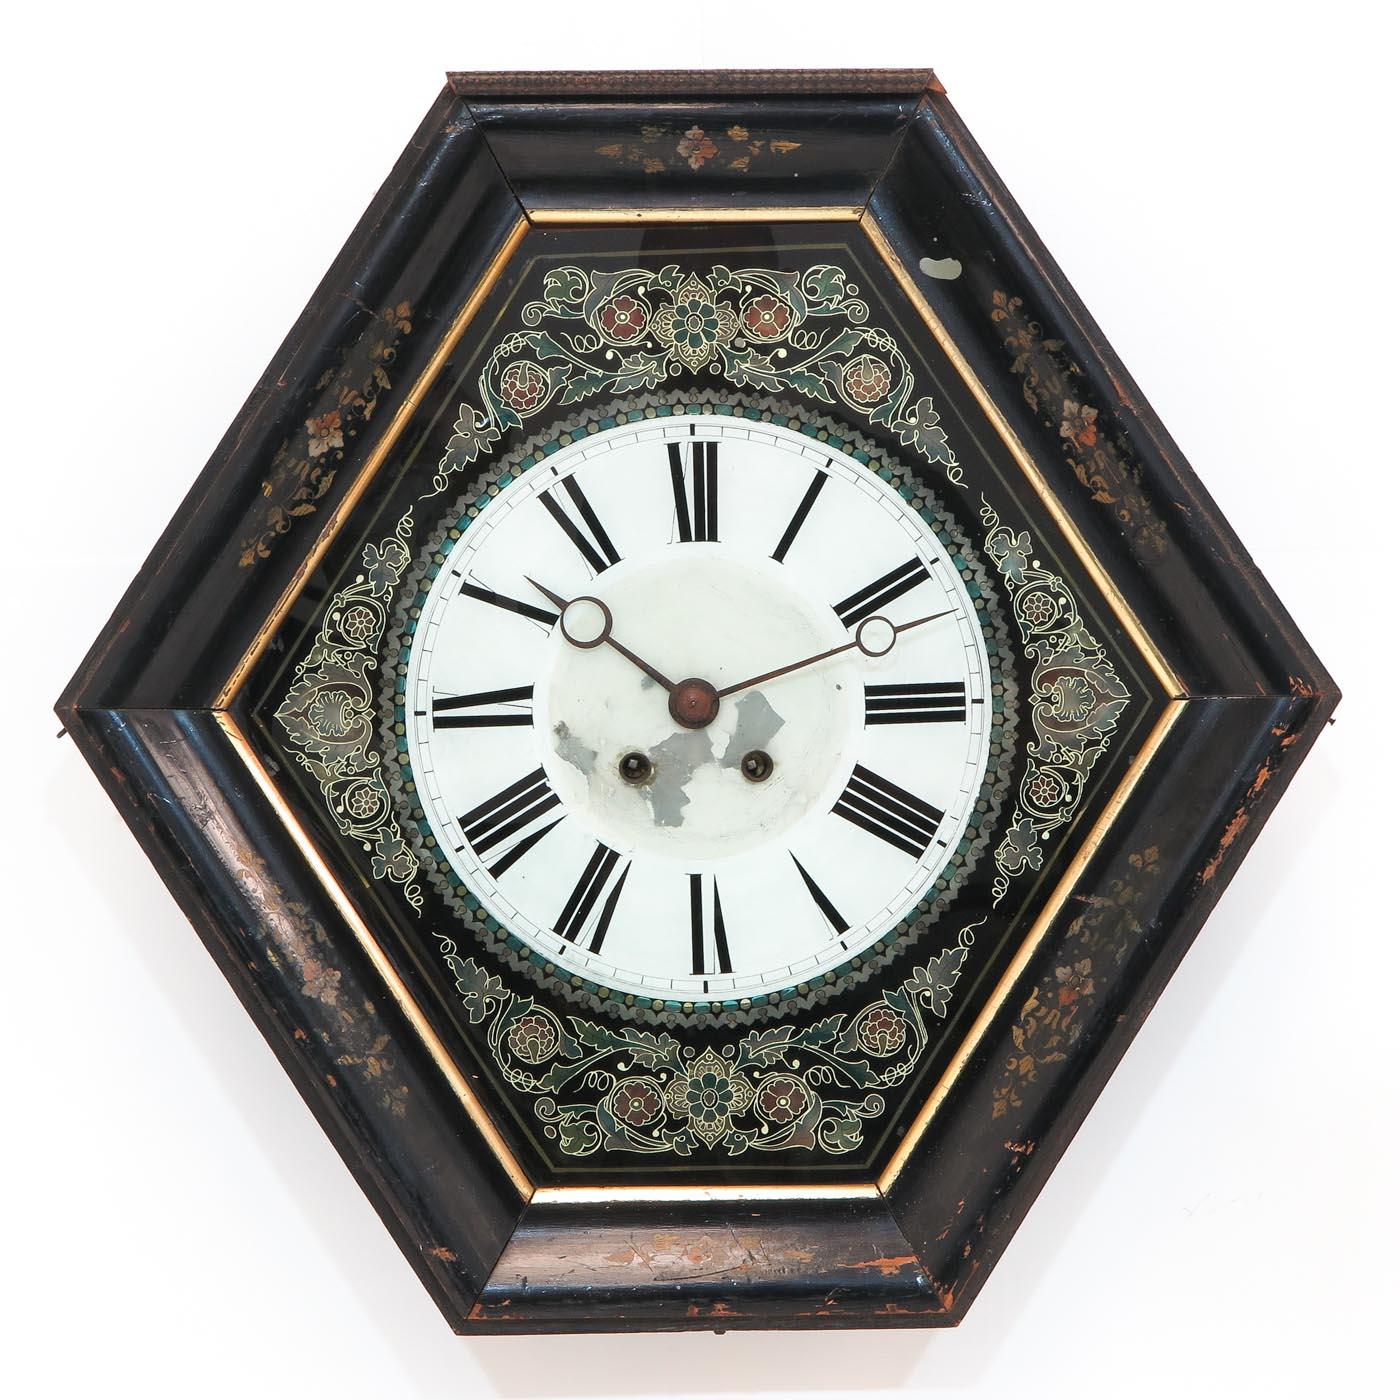 Lot 1444 - A French Wall Clock Circa 1880